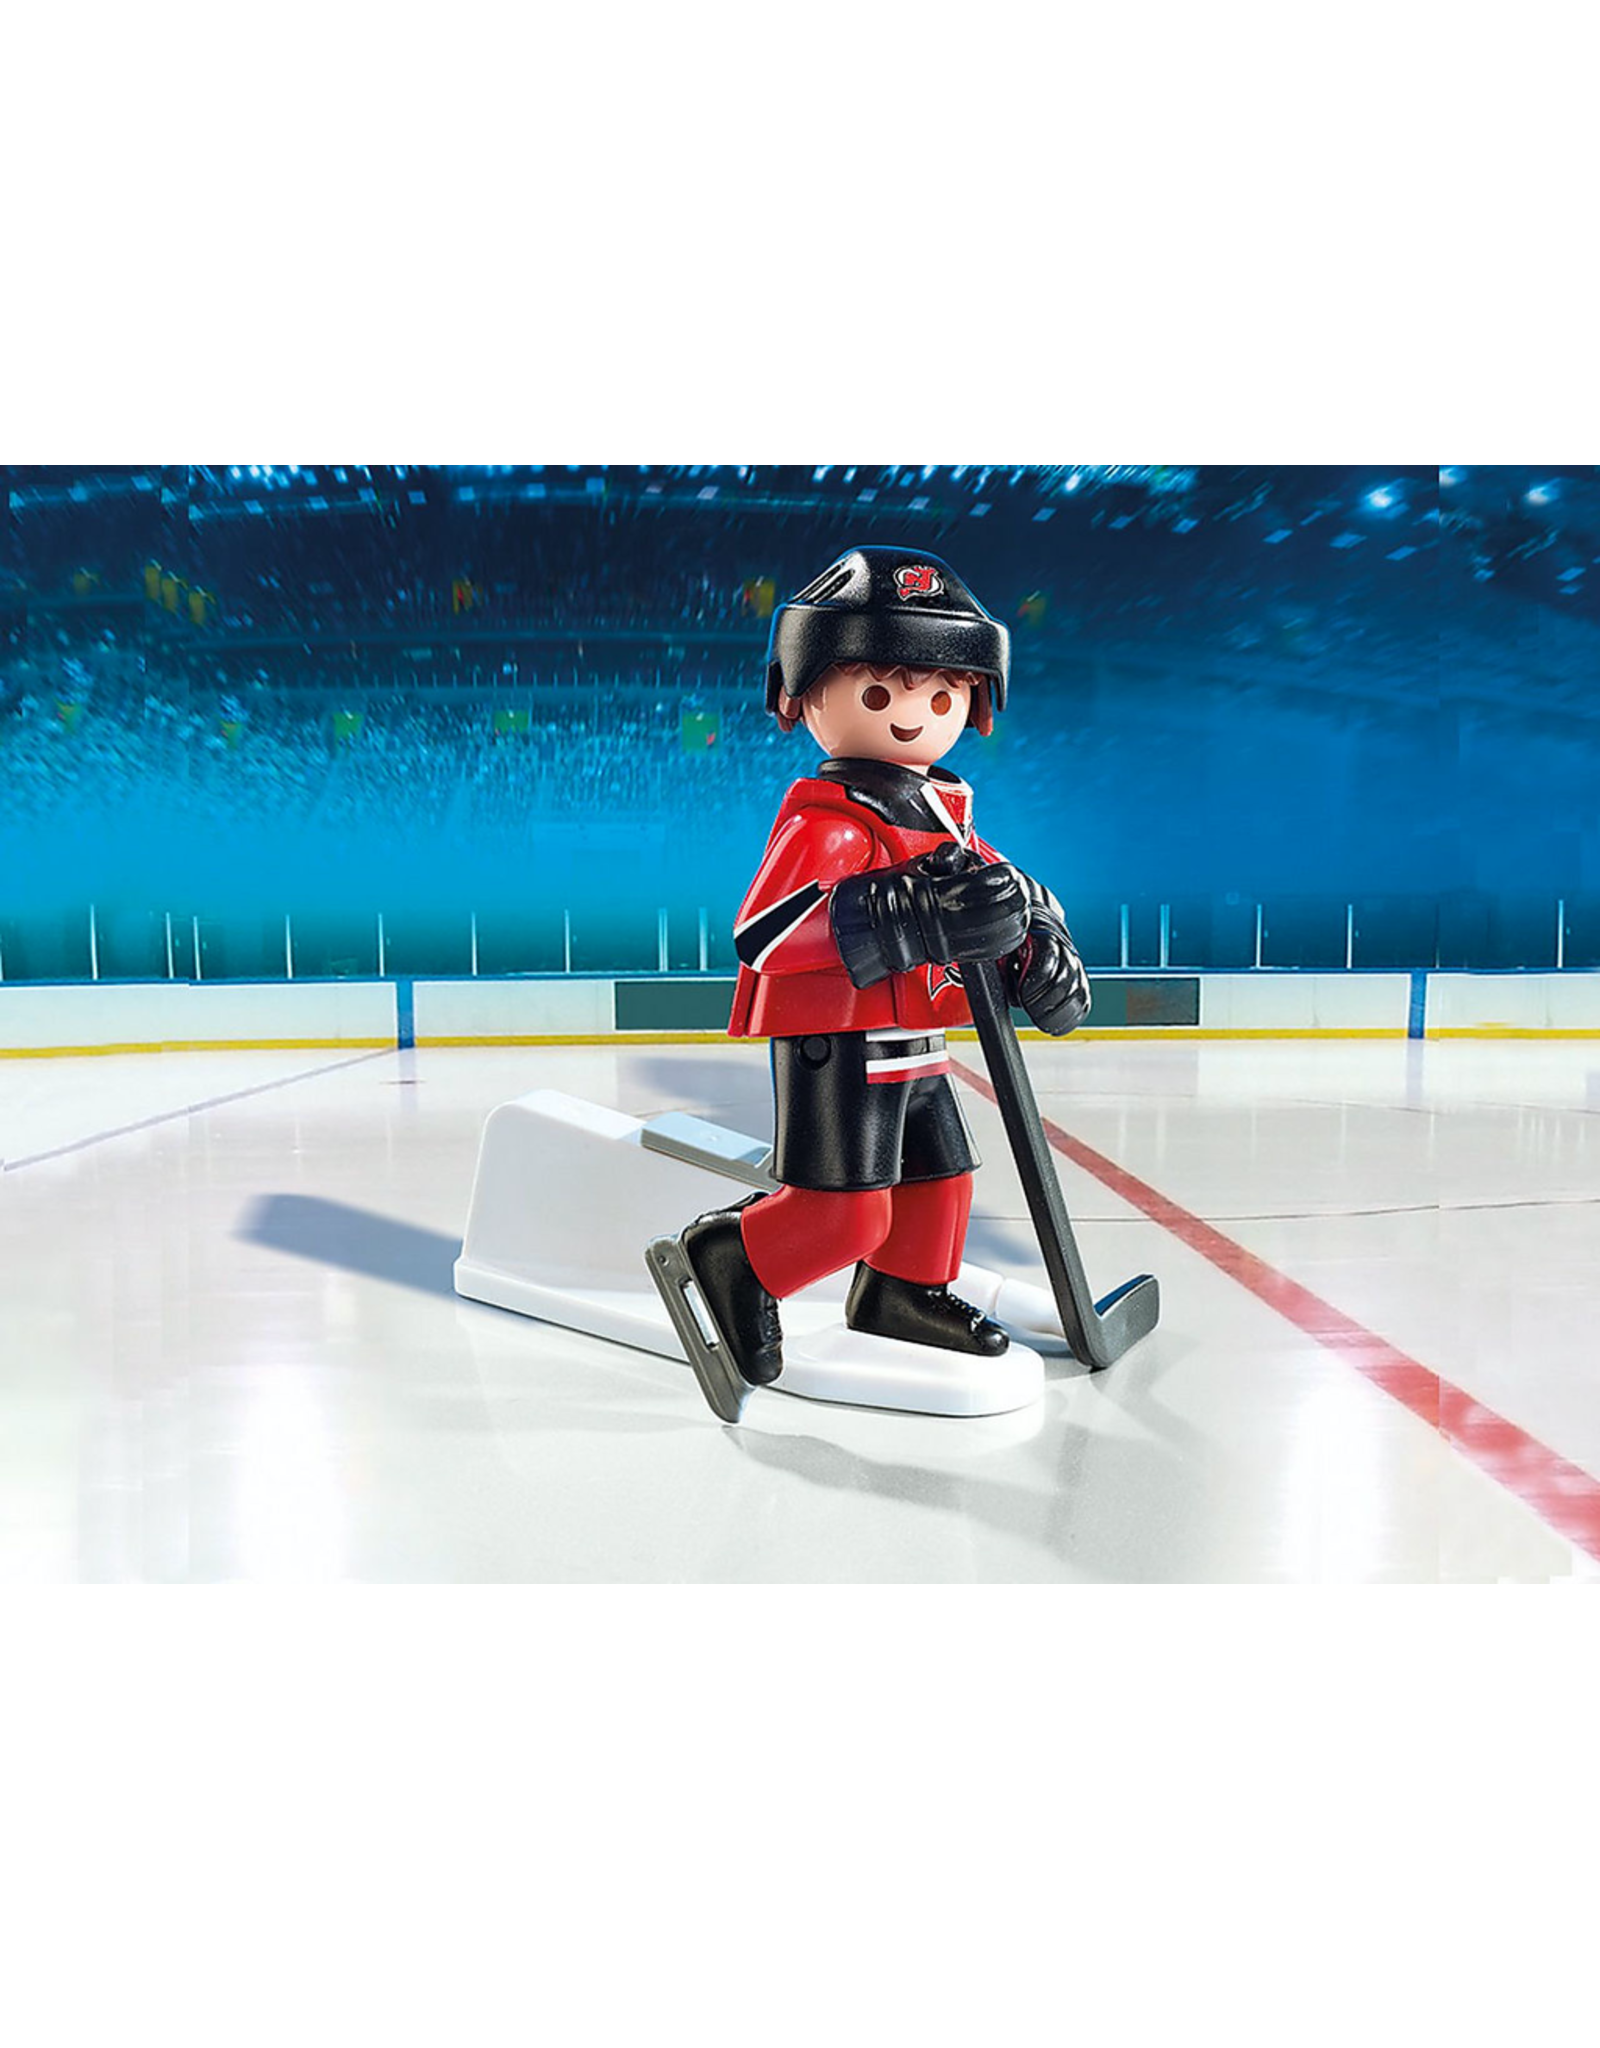 Playmobil NHL® NEW JERSEY DEVILS® PLAYER 9037